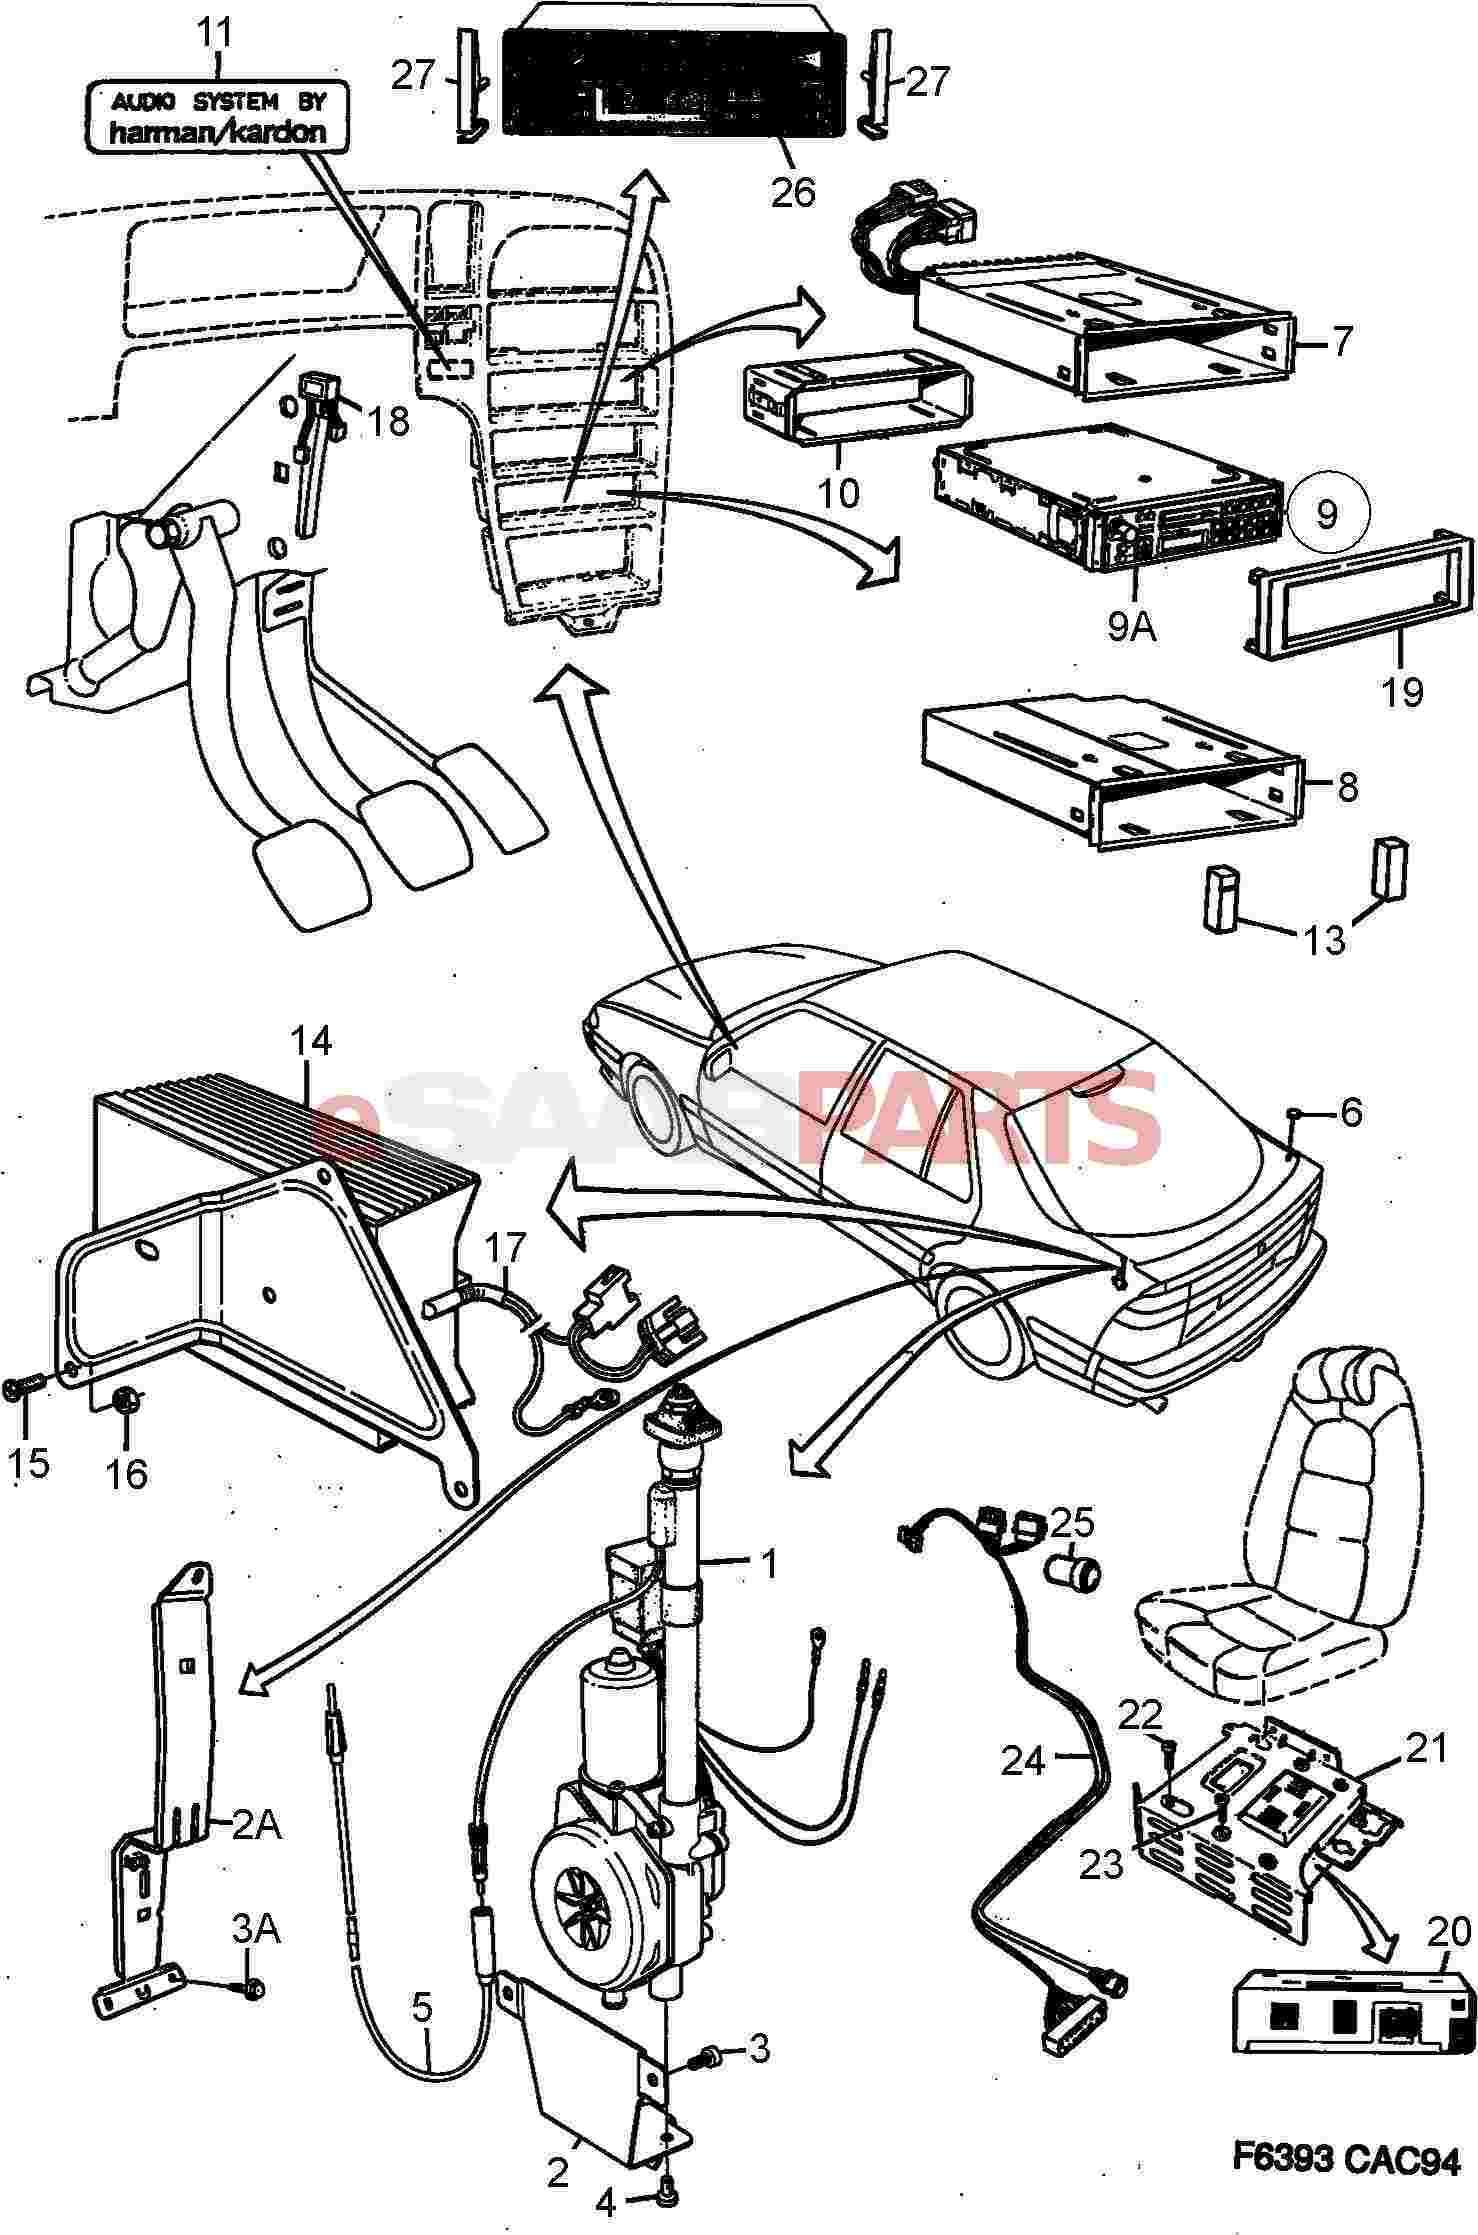 Saab Trionic Wiring Diagram Radio Electrical Aerial